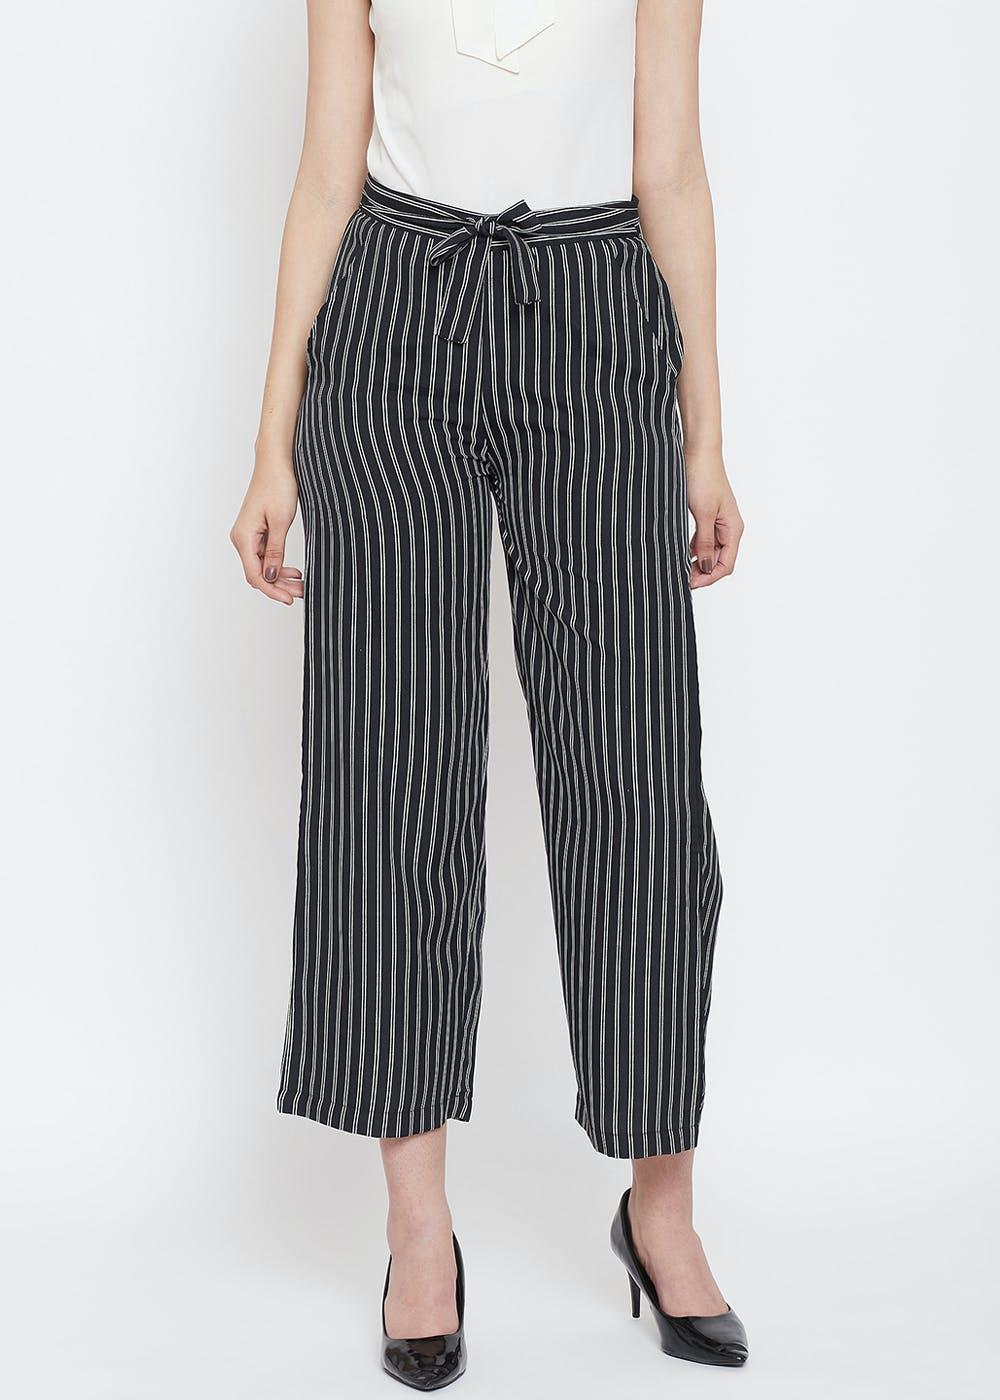 Waist Tie Detail Monochrome Striped Flared Trousers